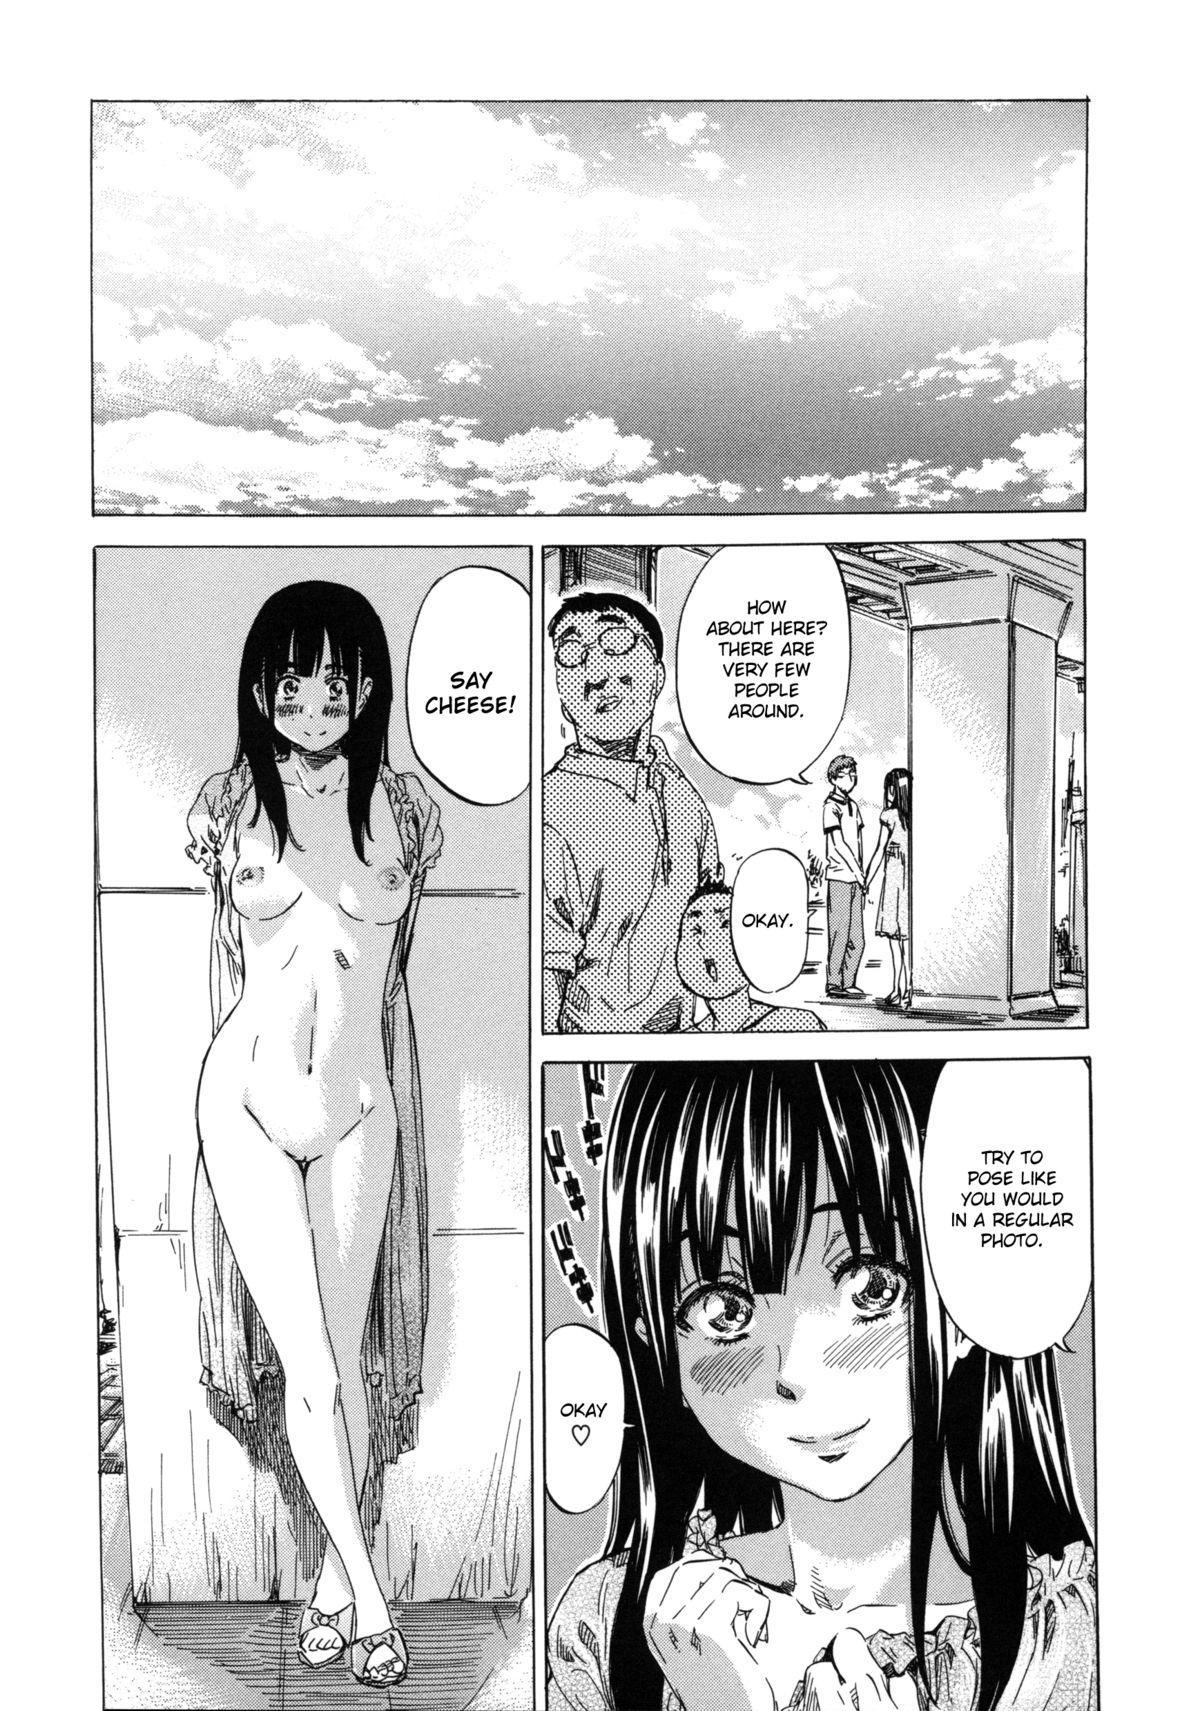 Kashiwazaki Miki wa Ironna Basho de Zenra Sanpo Shitemita | Miki Kashiwazaki Goes Naked in All Sorts of Places 113